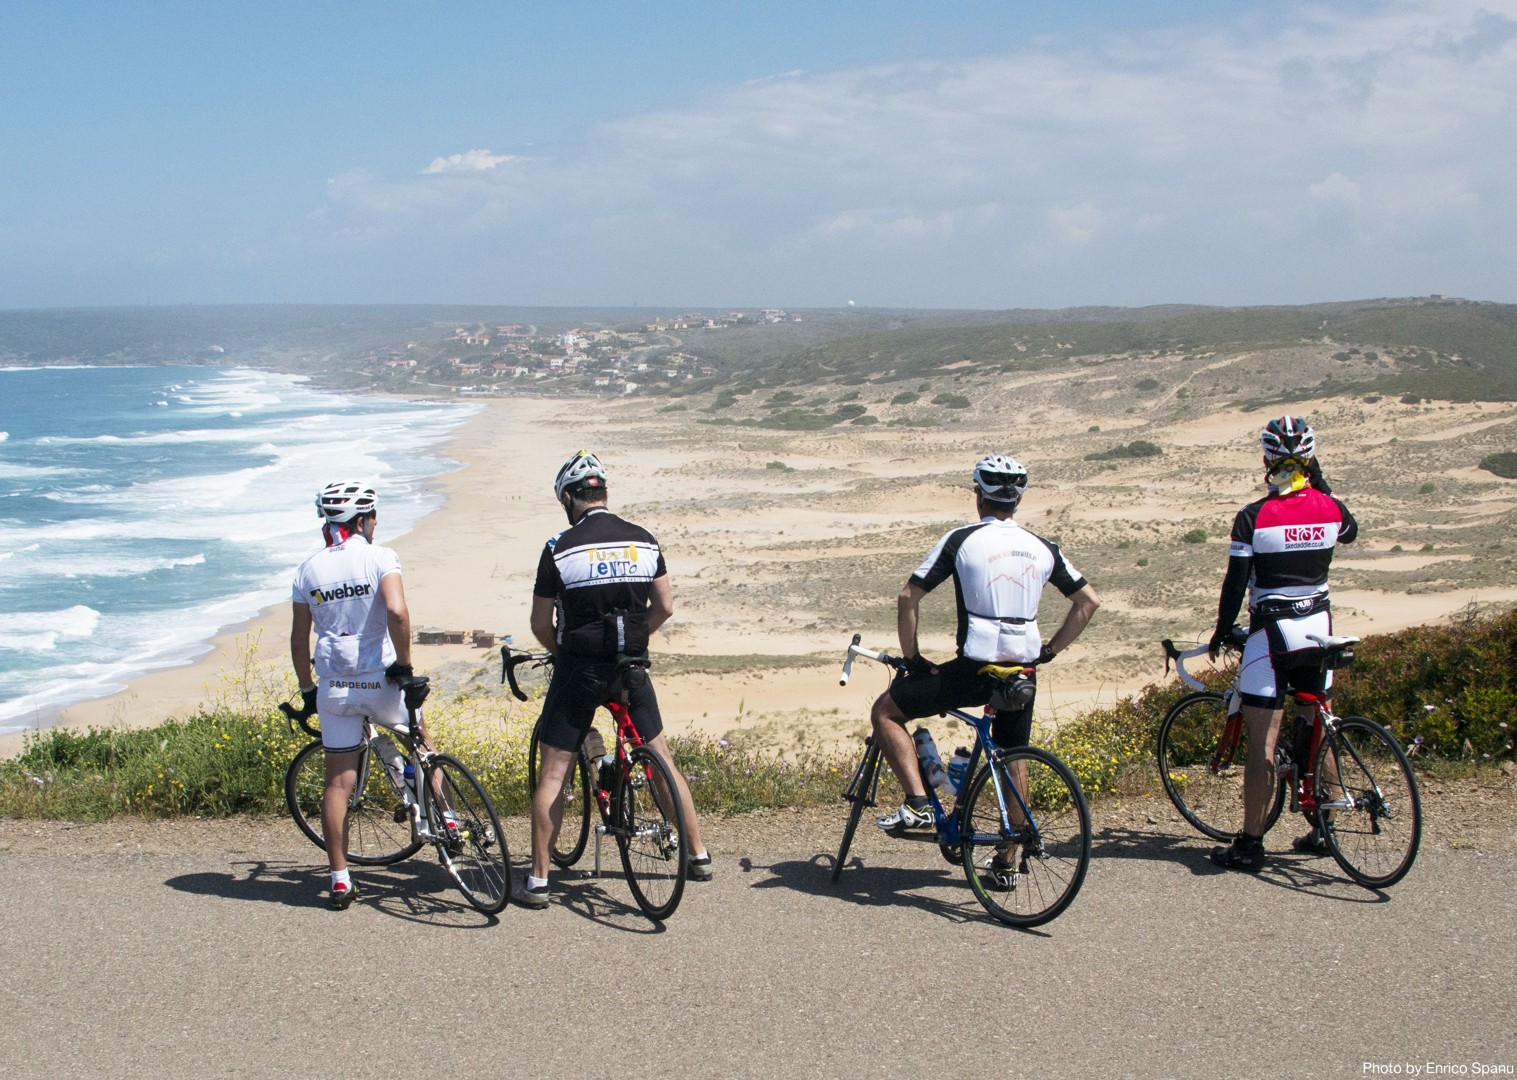 Road-Cycling-Holiday-Italy-Sardinia-Coastal-Explorer-Montiferru.jpg - Italy - Sardinia - Coastal Explorer - Road Cycling